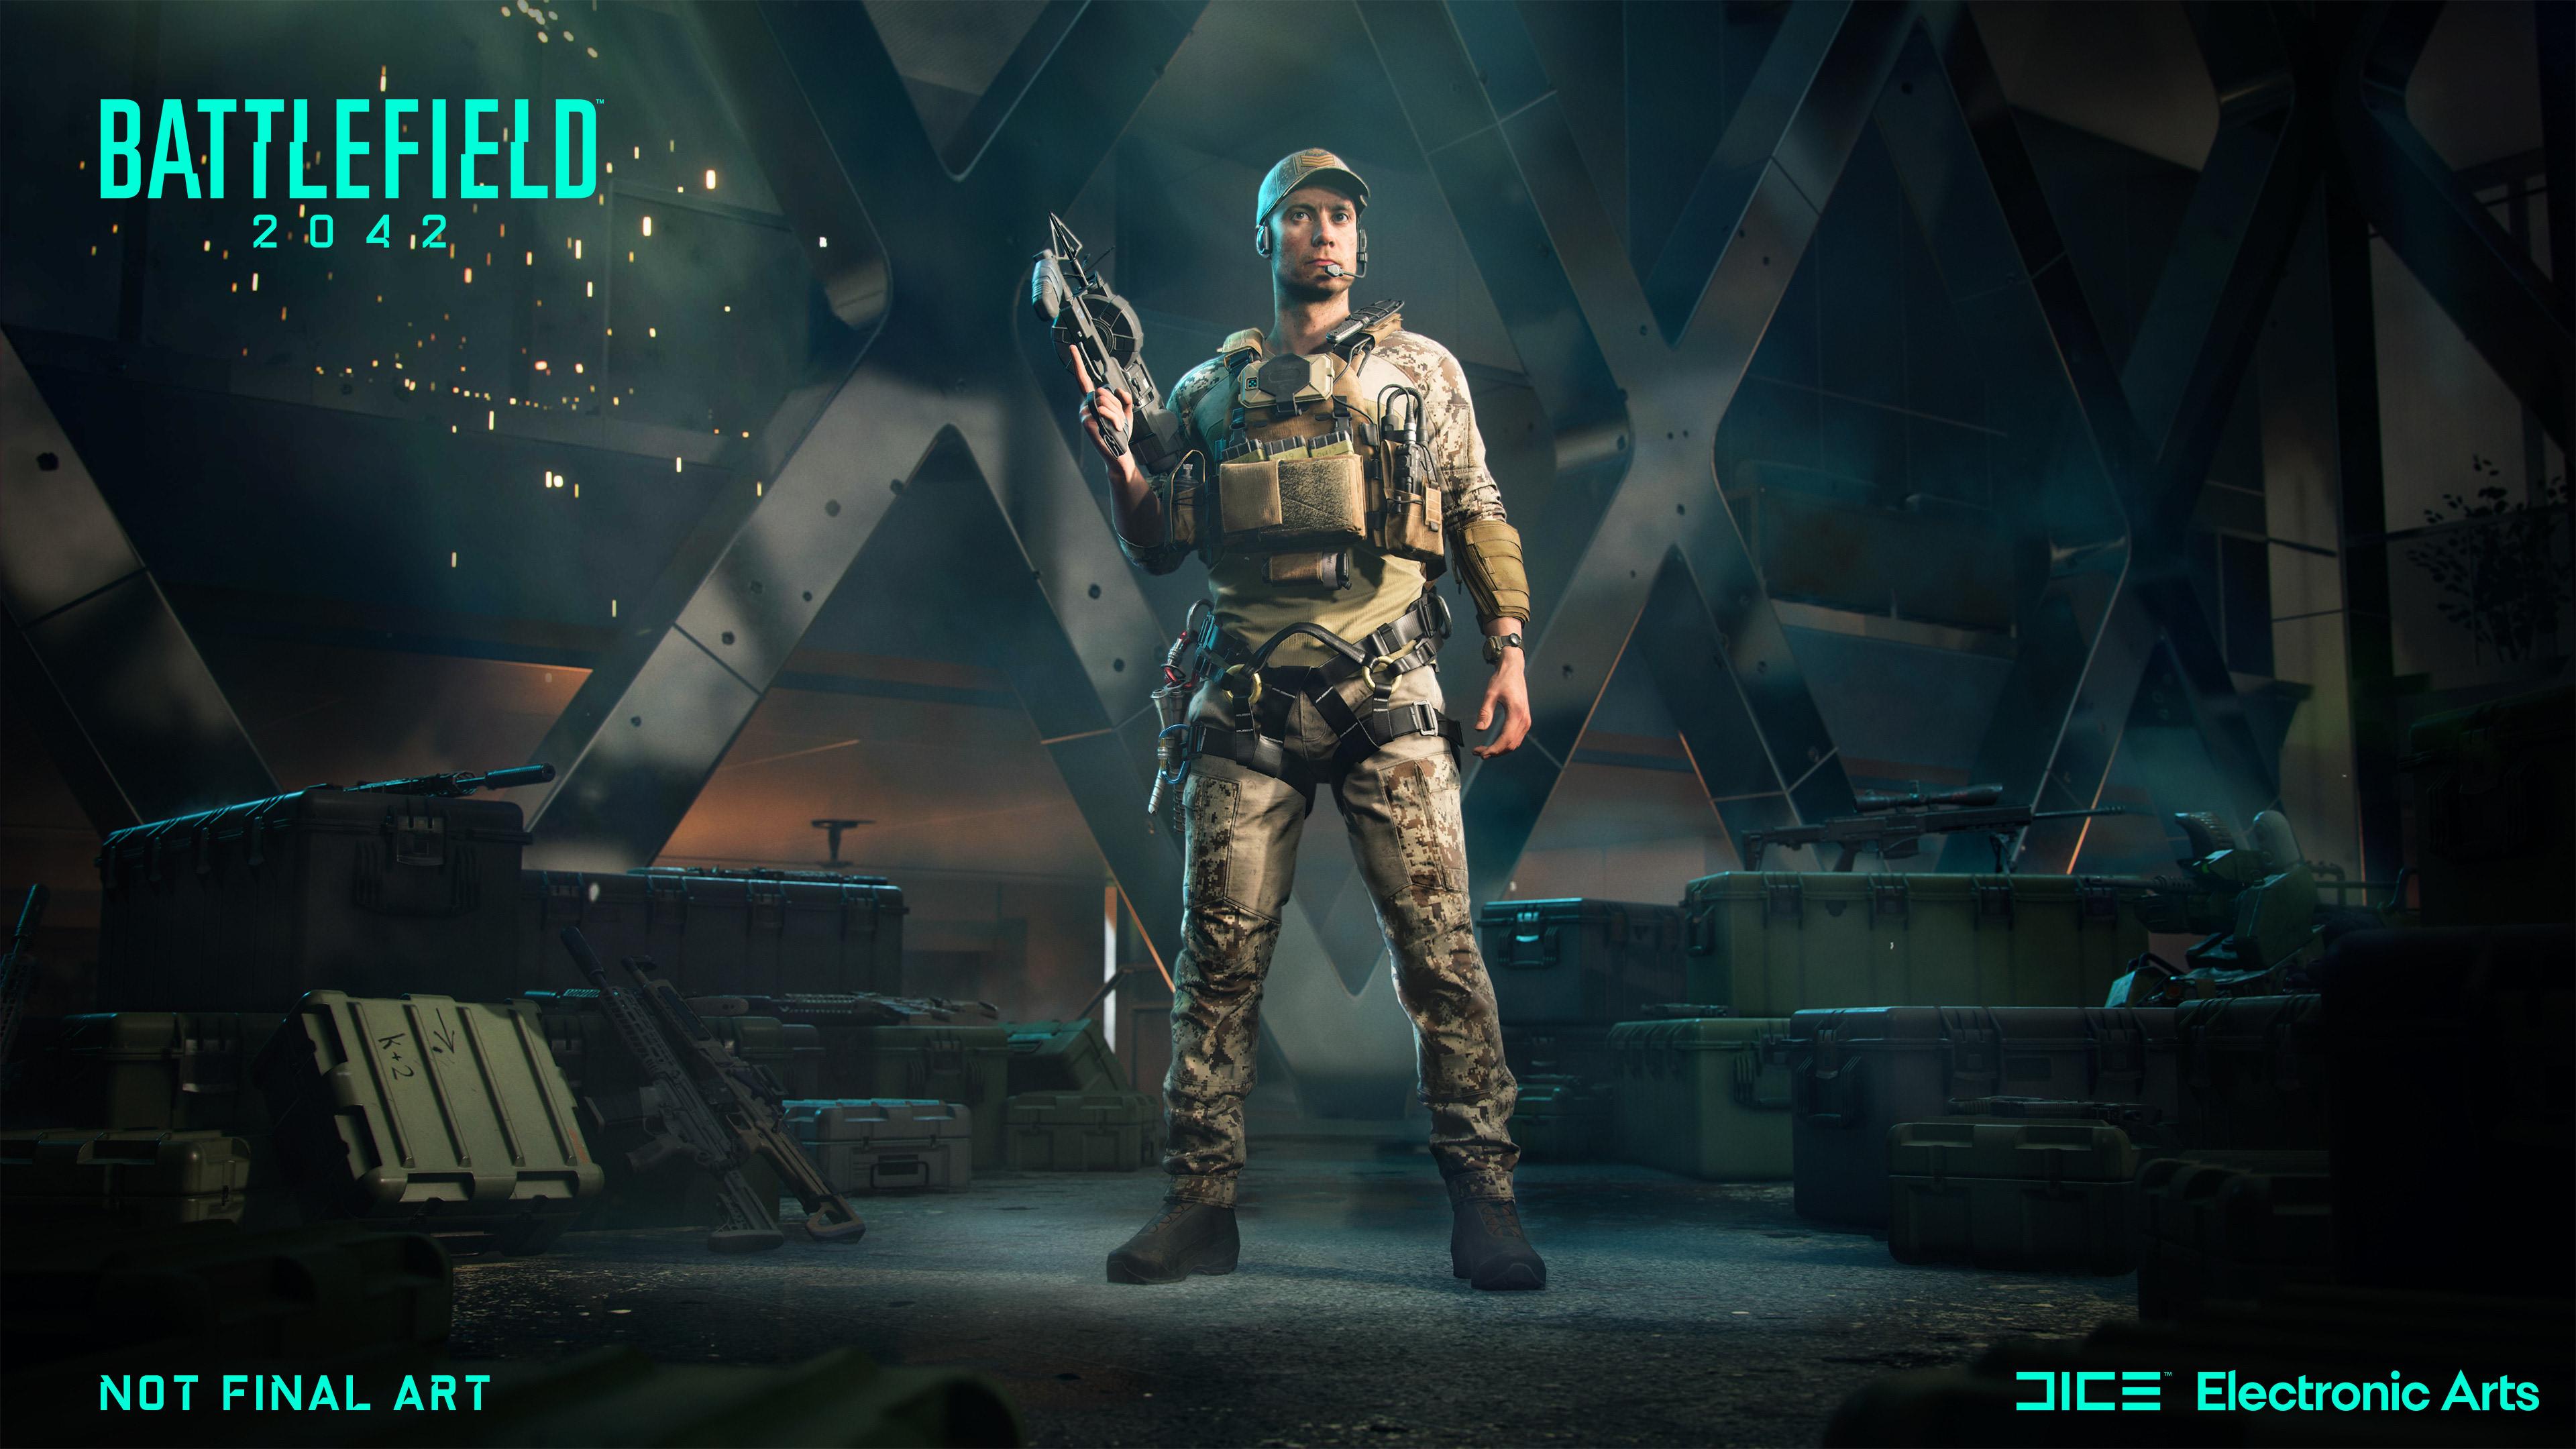 Battlefield 2042 4k Ultra HD Wallpaper Background Image 3840x2160 3840x2160